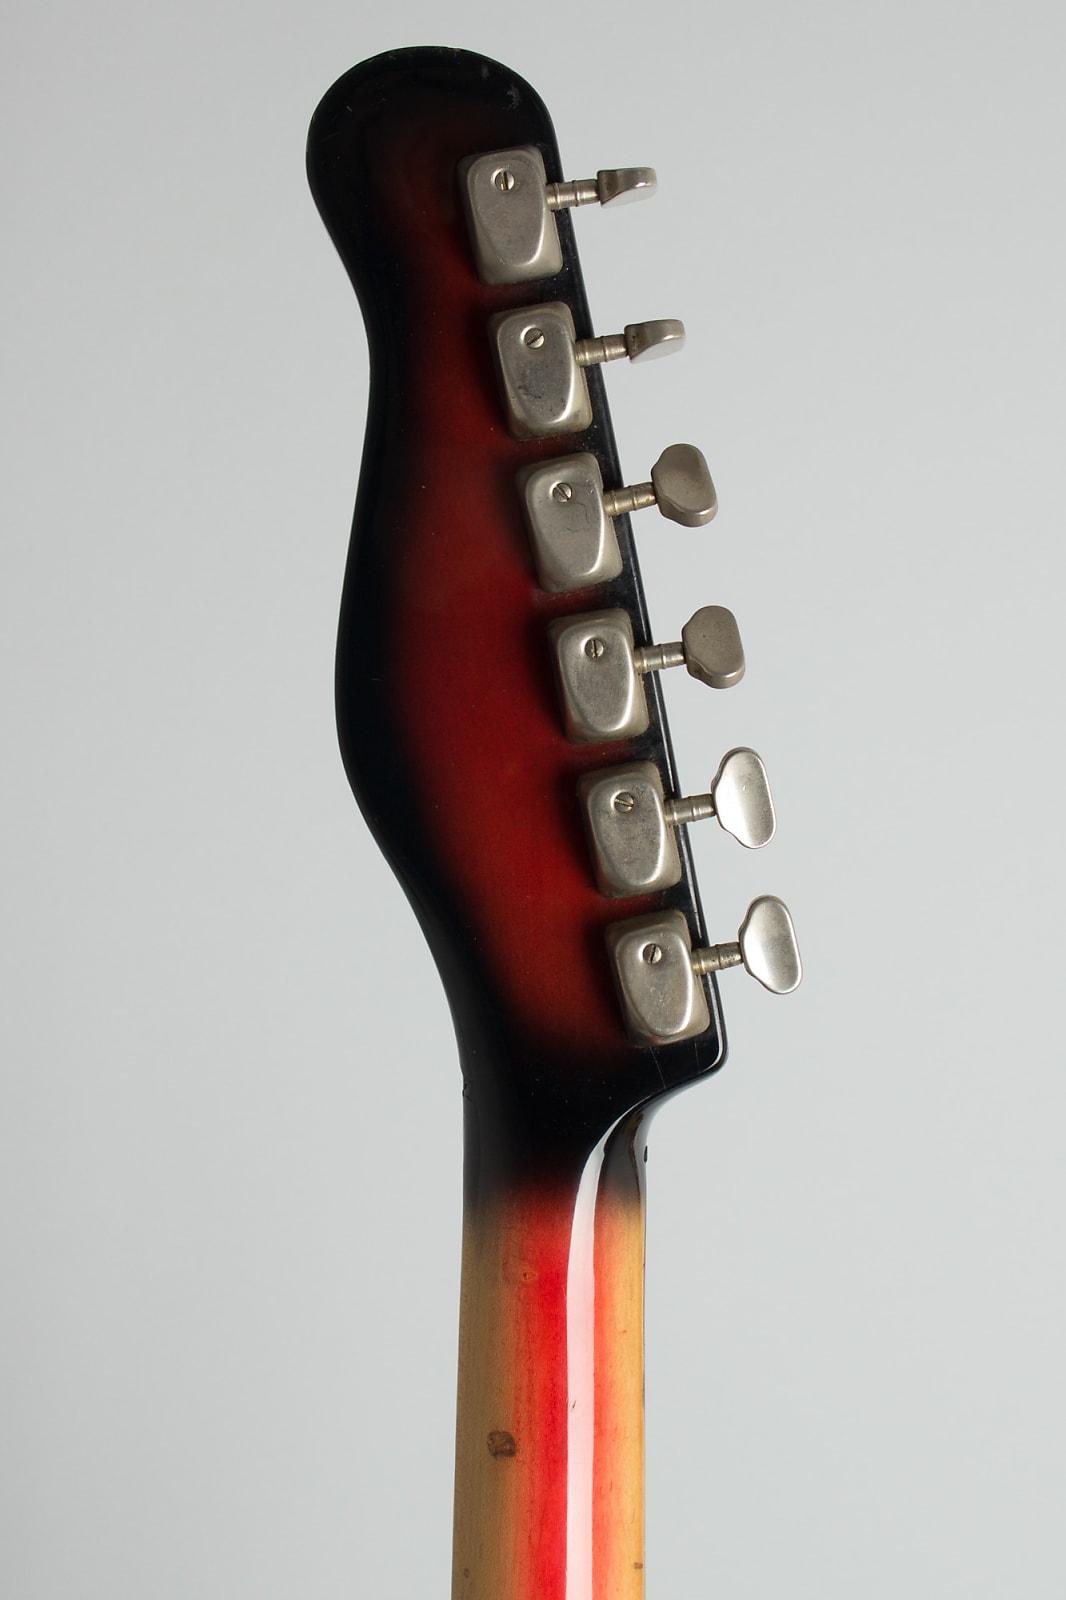 Baldwin - Burns  Jazz Split Sound Solid Body Electric Guitar (1965), ser. #13563, black gig bag case.